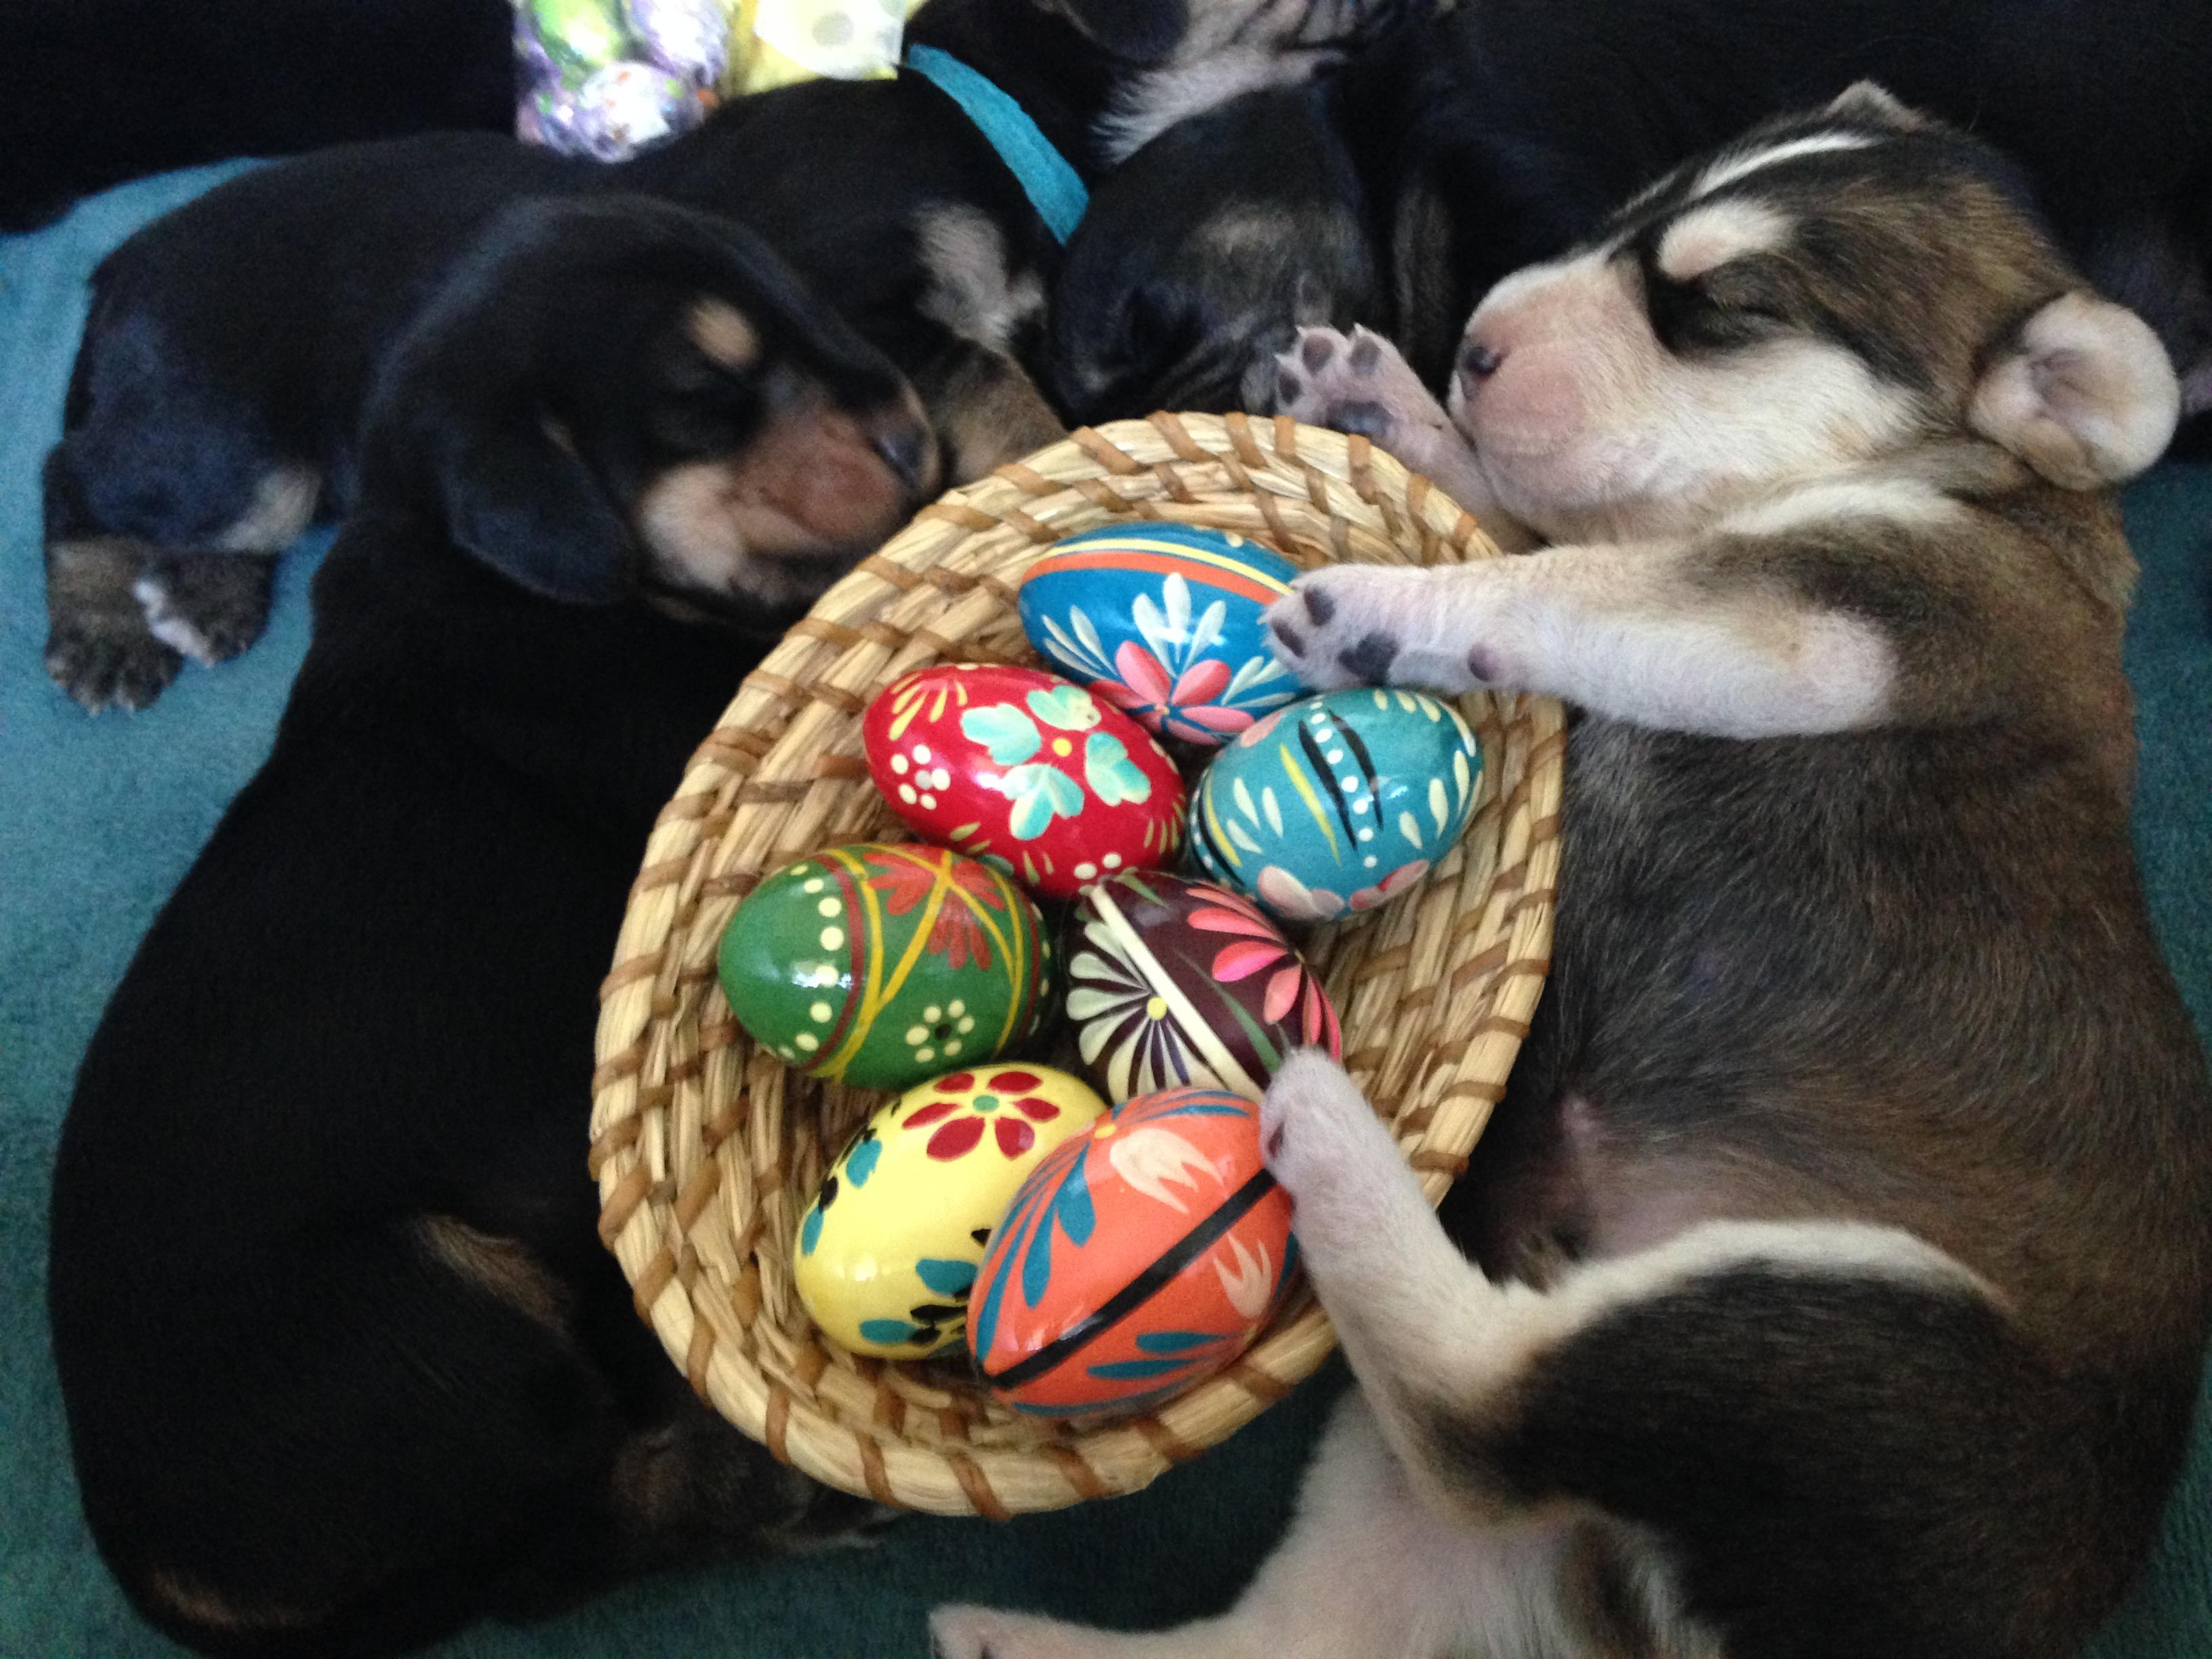 Blue Fairy Otterhound Puppies 2016: Day 9 – Easter Pups ...